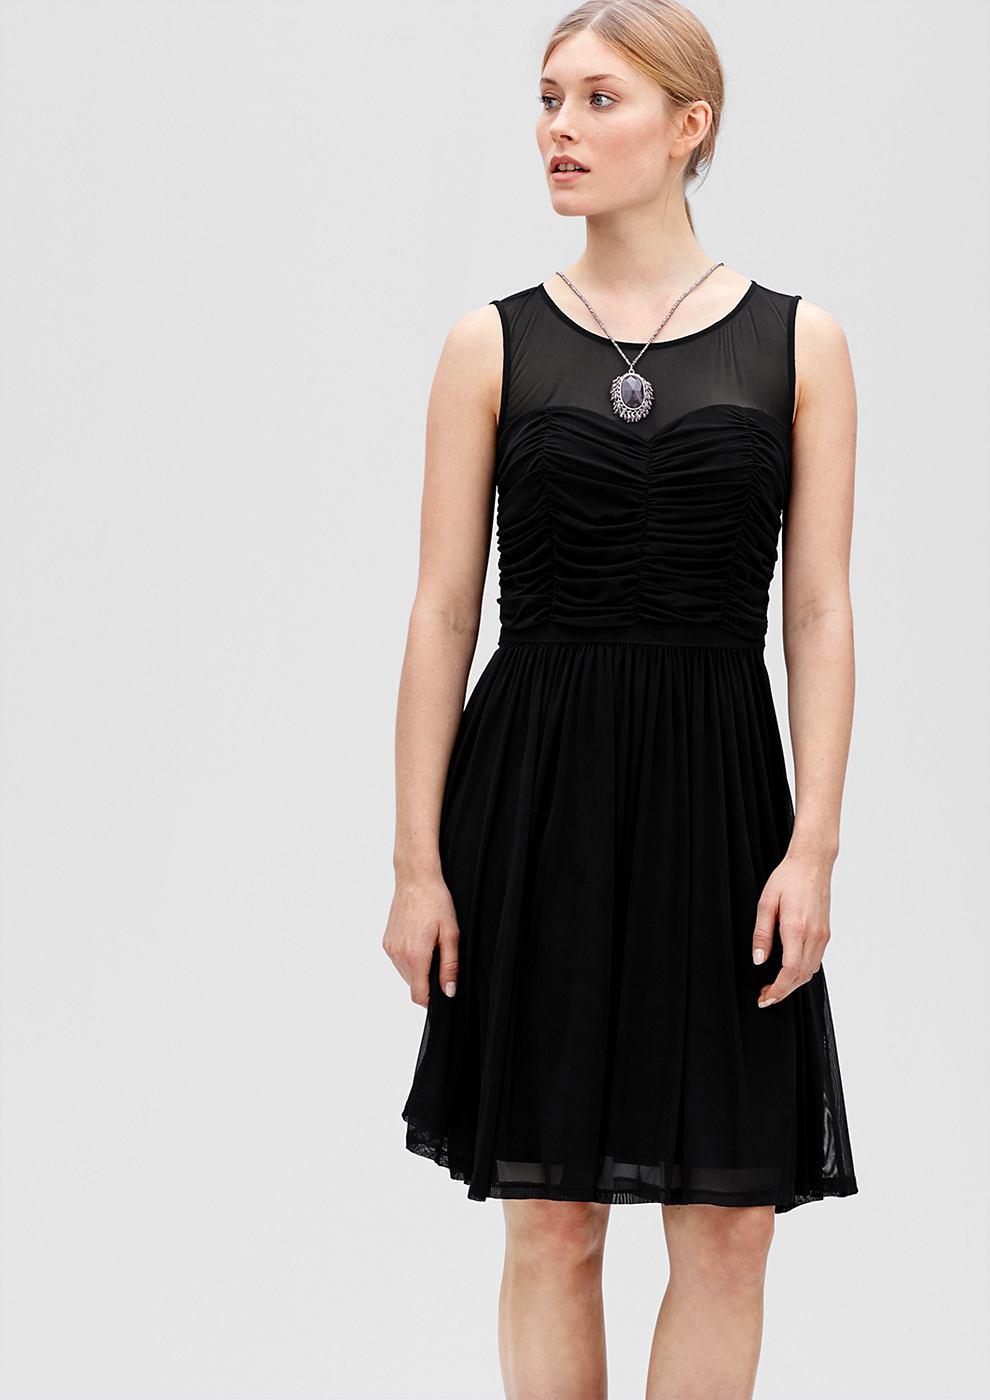 s.Oliver Premium Mesh jurk met rafels zwart